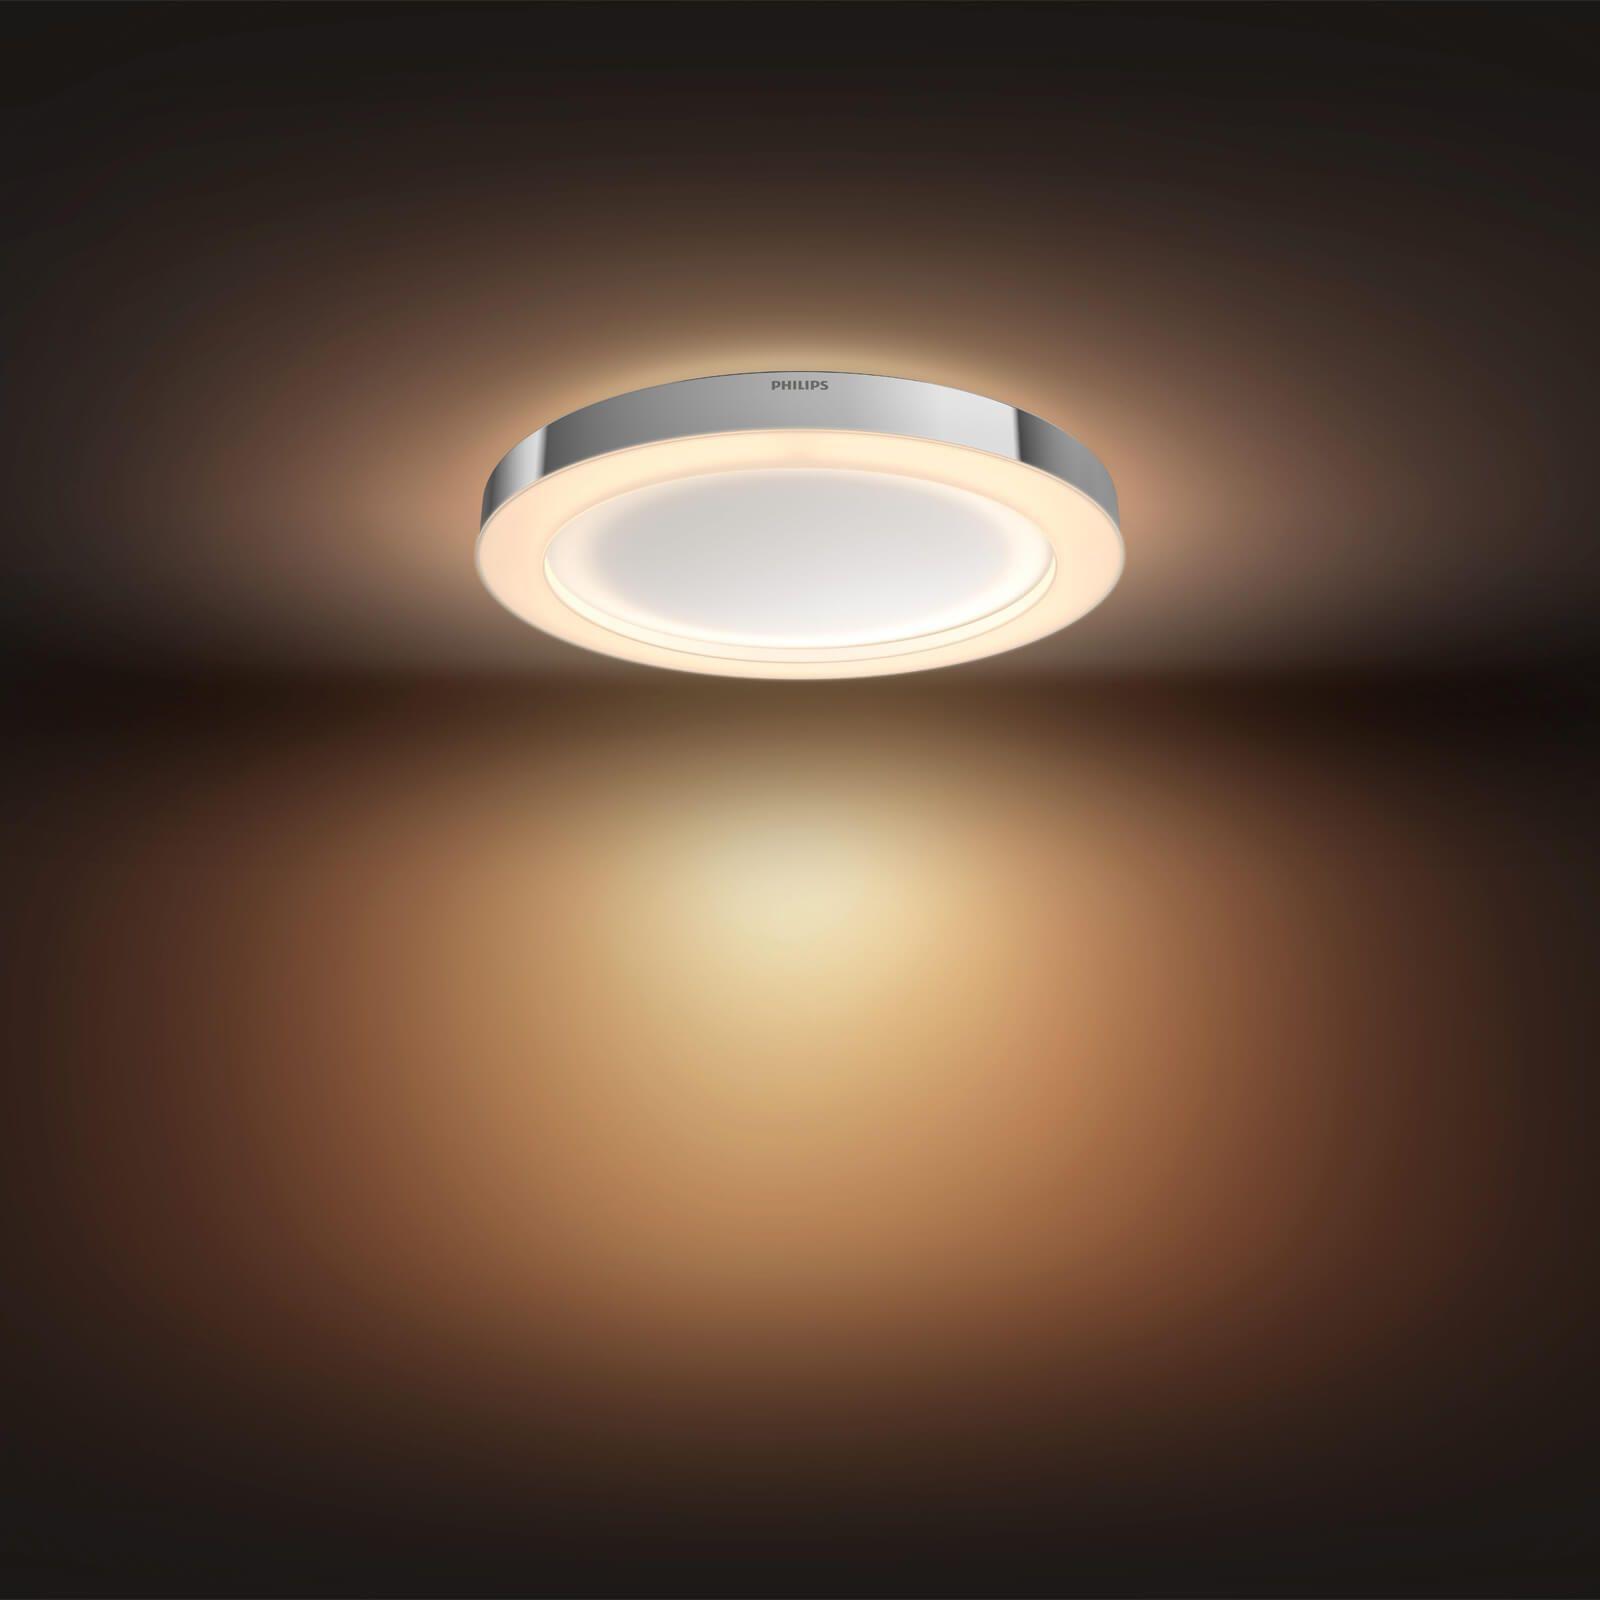 Philips Hue Adore Bathroom Plafondlamp White Ambiance Chroom Met Afbeeldingen Plafondlamp Lampen Verlichting